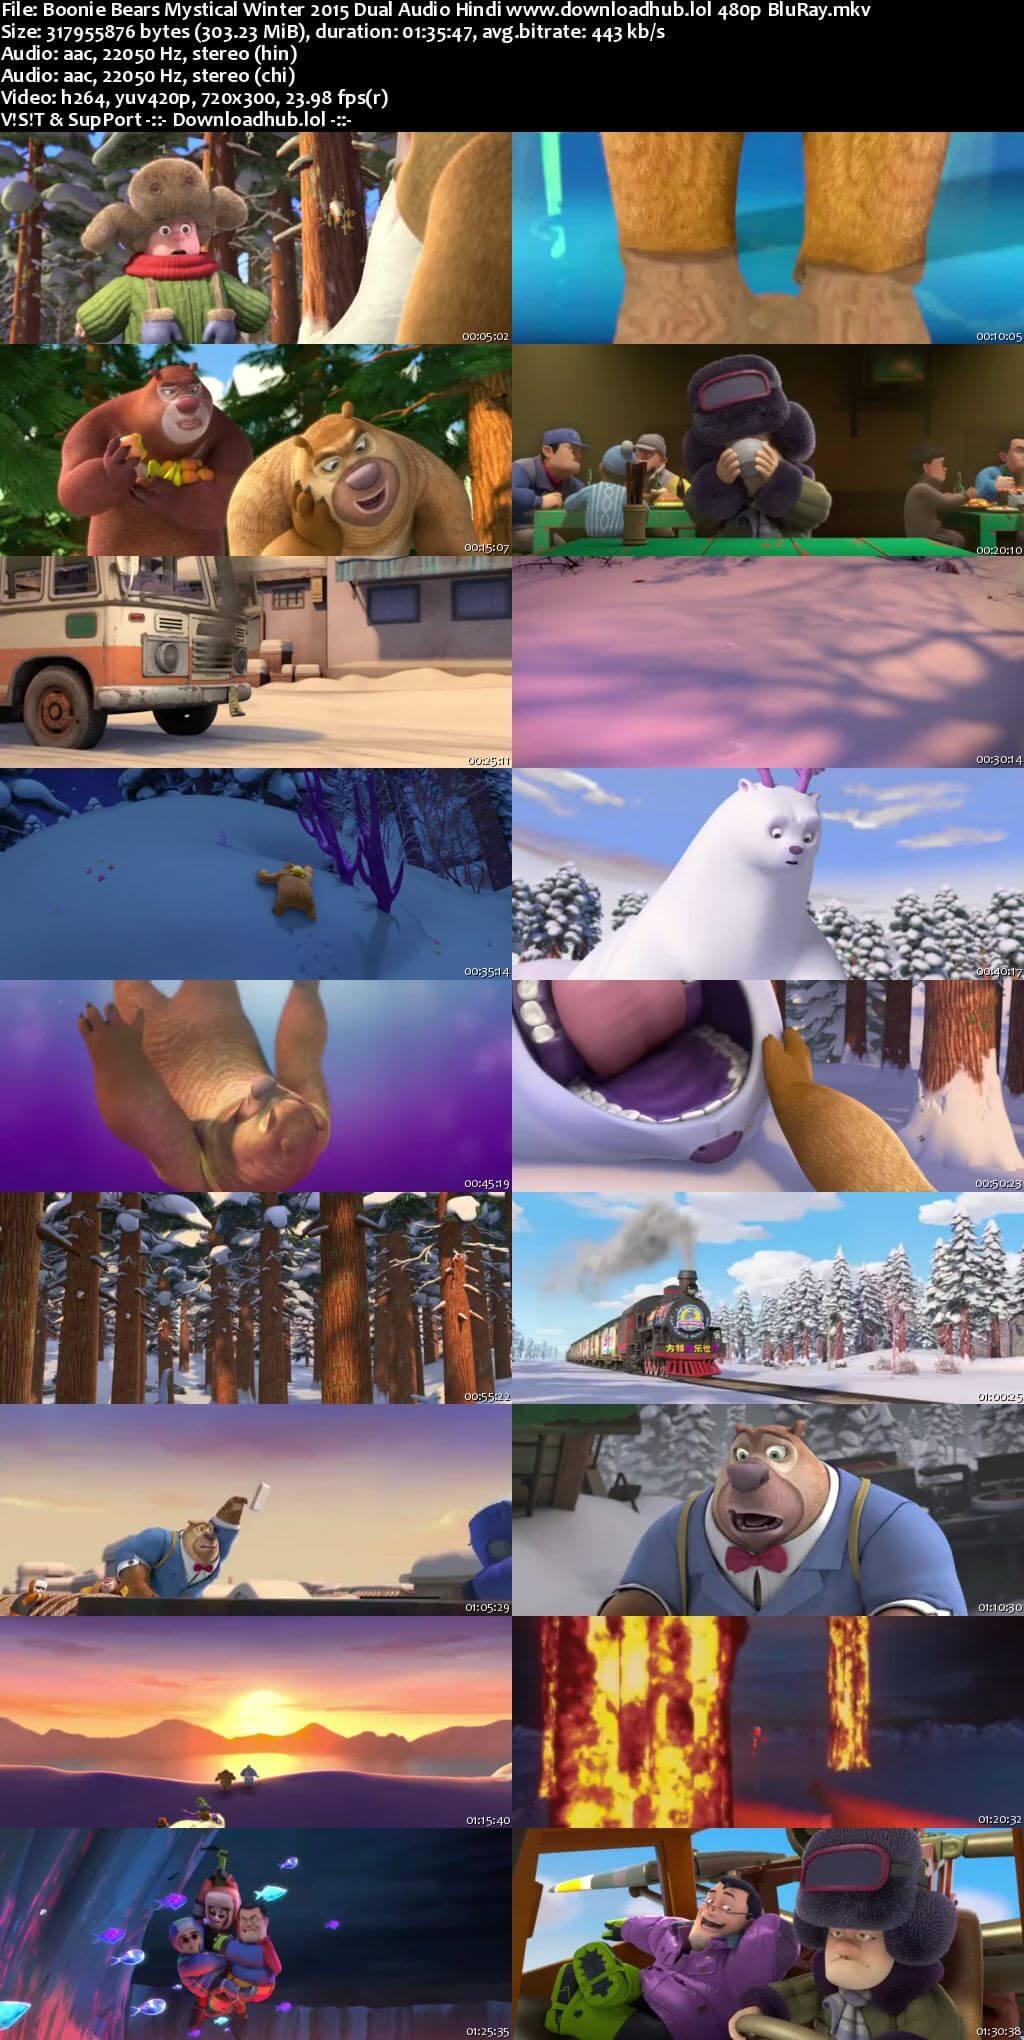 Boonie Bears Mystical Winter 2015 Hindi Dual Audio 300MB BluRay 480p